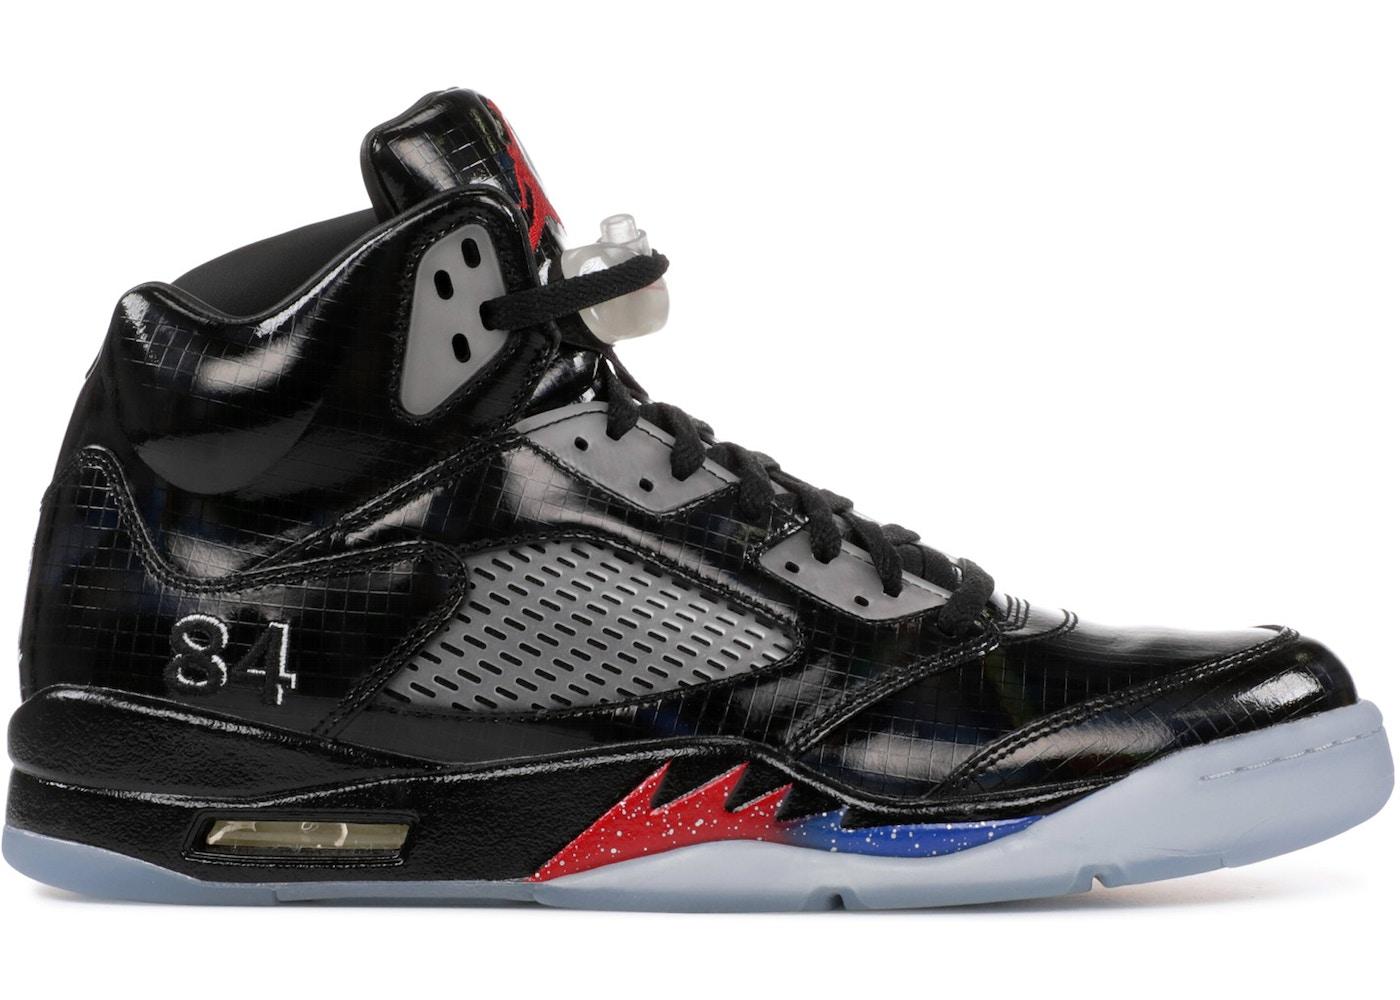 ce759b60be83 Air Jordan Shoes - Average Sale Price